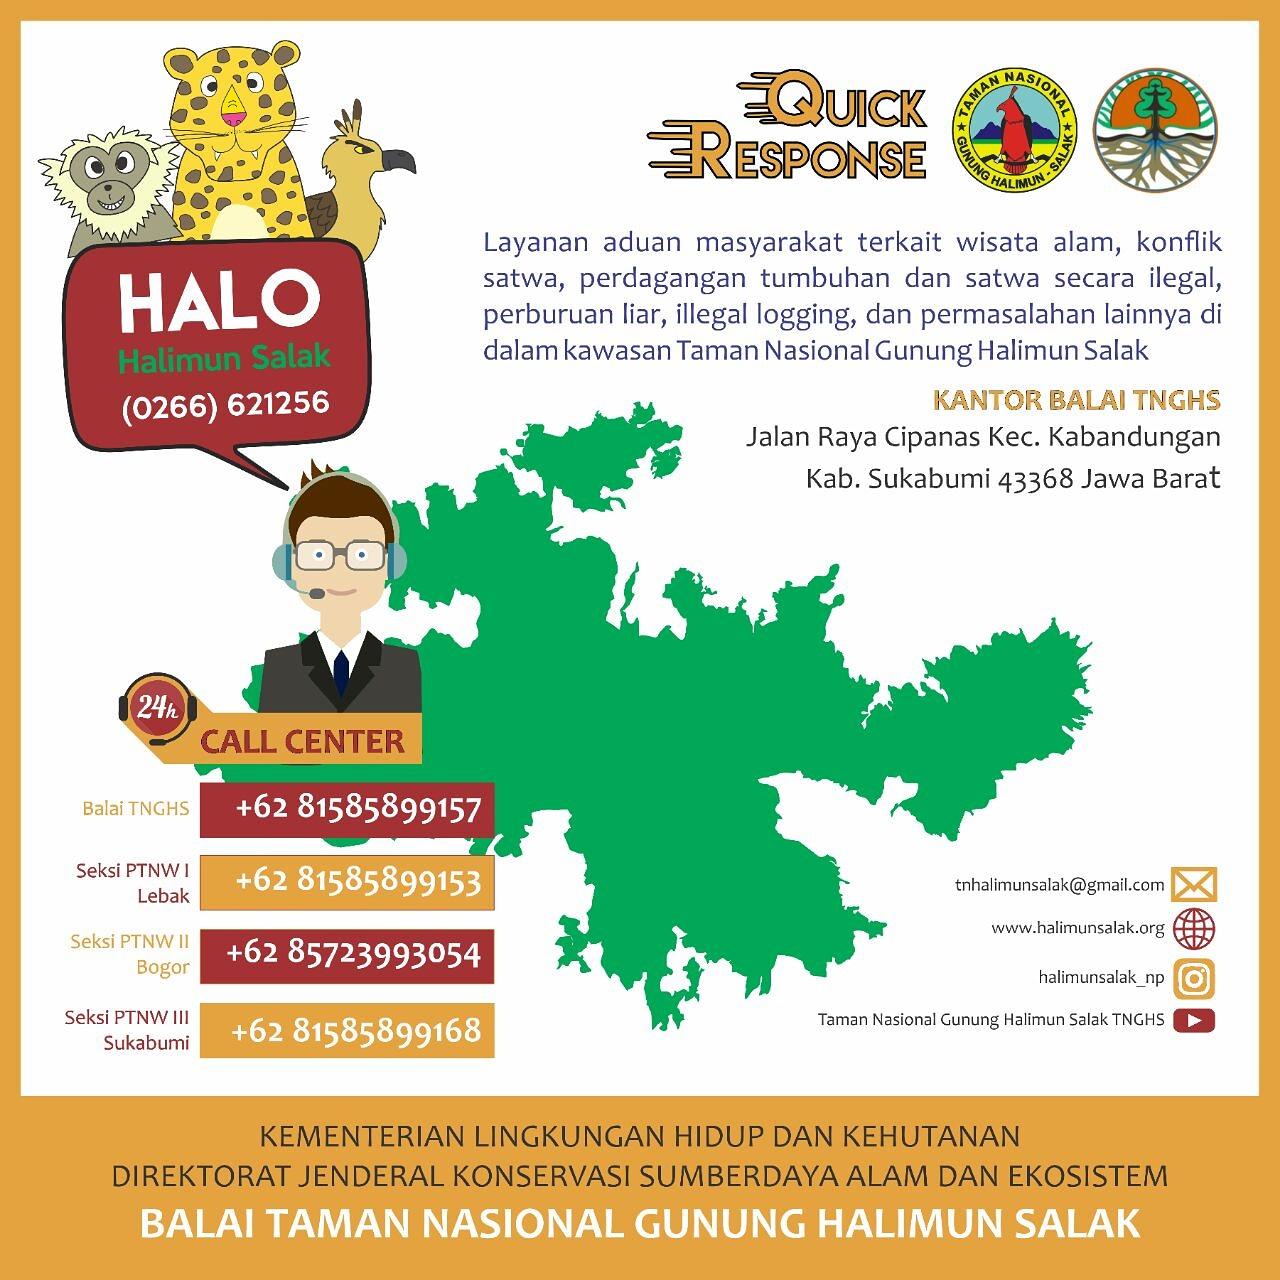 Quick Response Halimun Salak